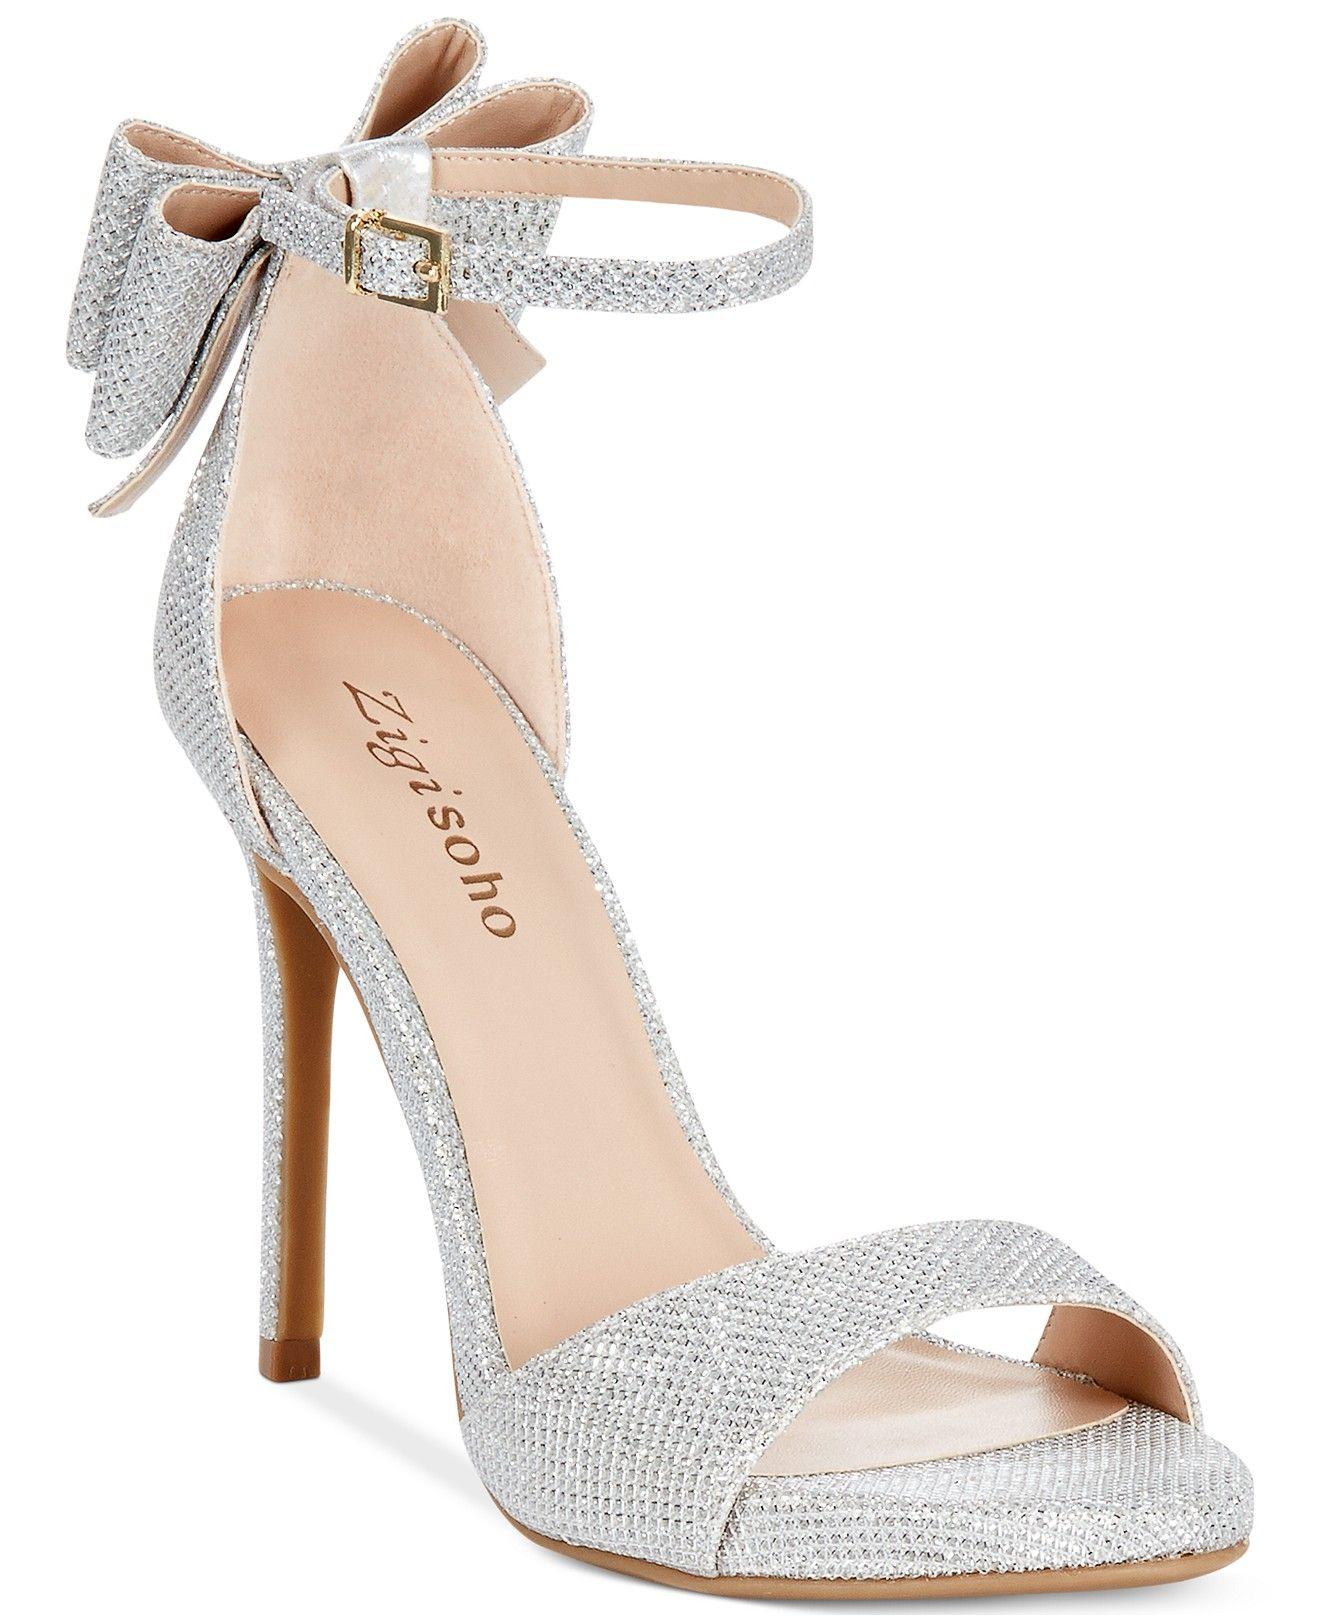 Zigi Soho Remi Two Piece Dress Sandals Evening Bridal Shoes Macy S Evening Shoes Heels Bridal Shoes